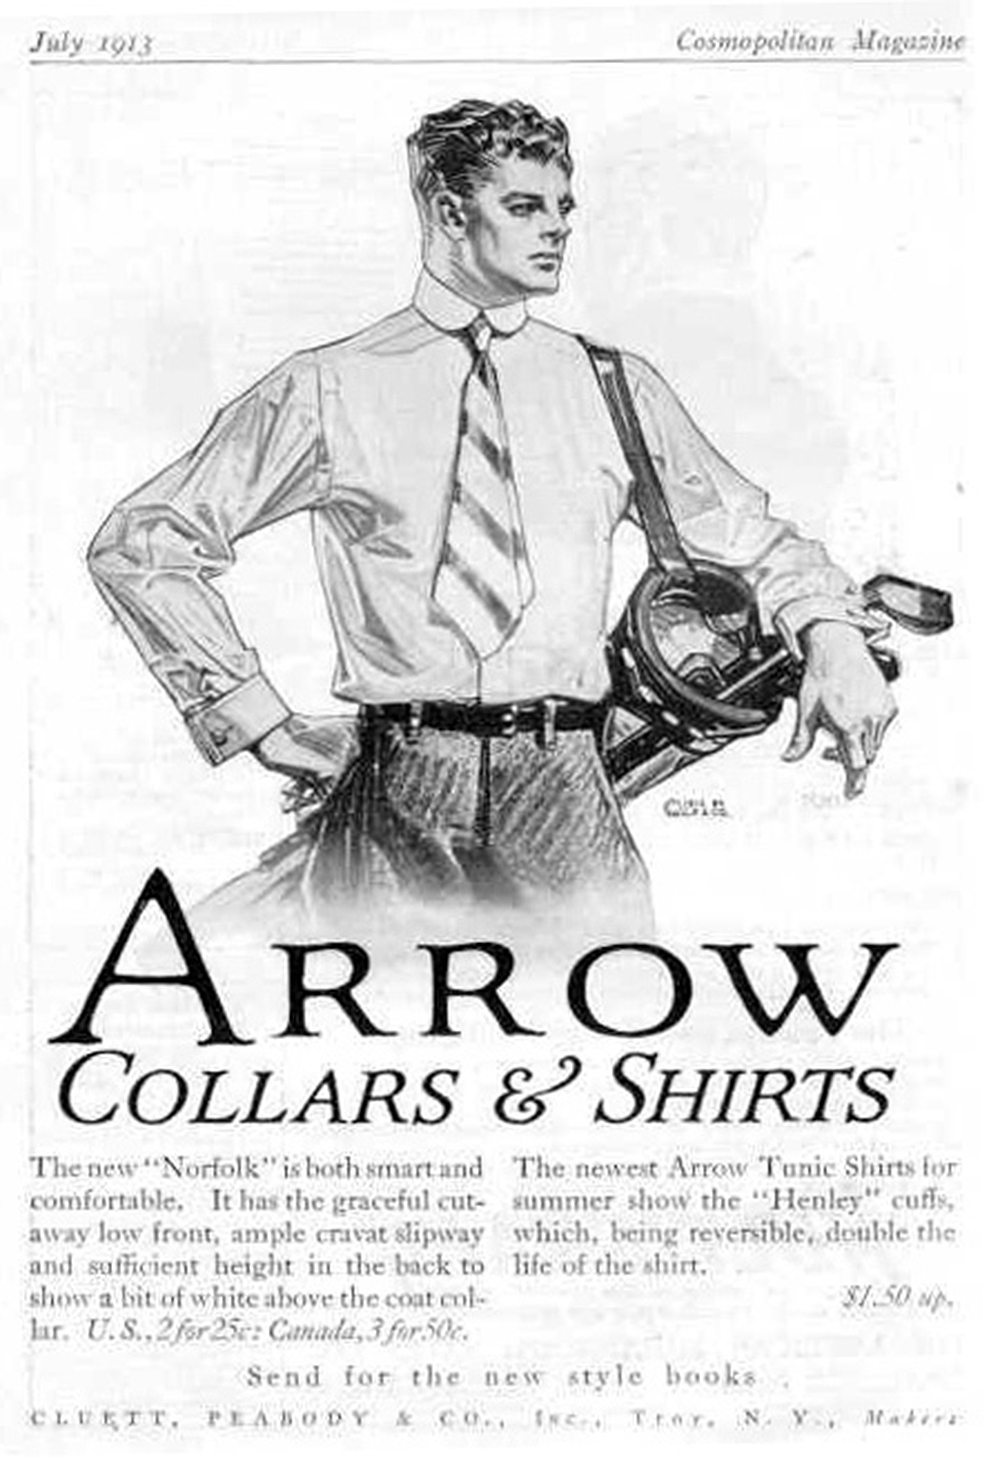 Arrow Collar ad by J.C. Leyendecker, 1913. Wikimedia Commons.